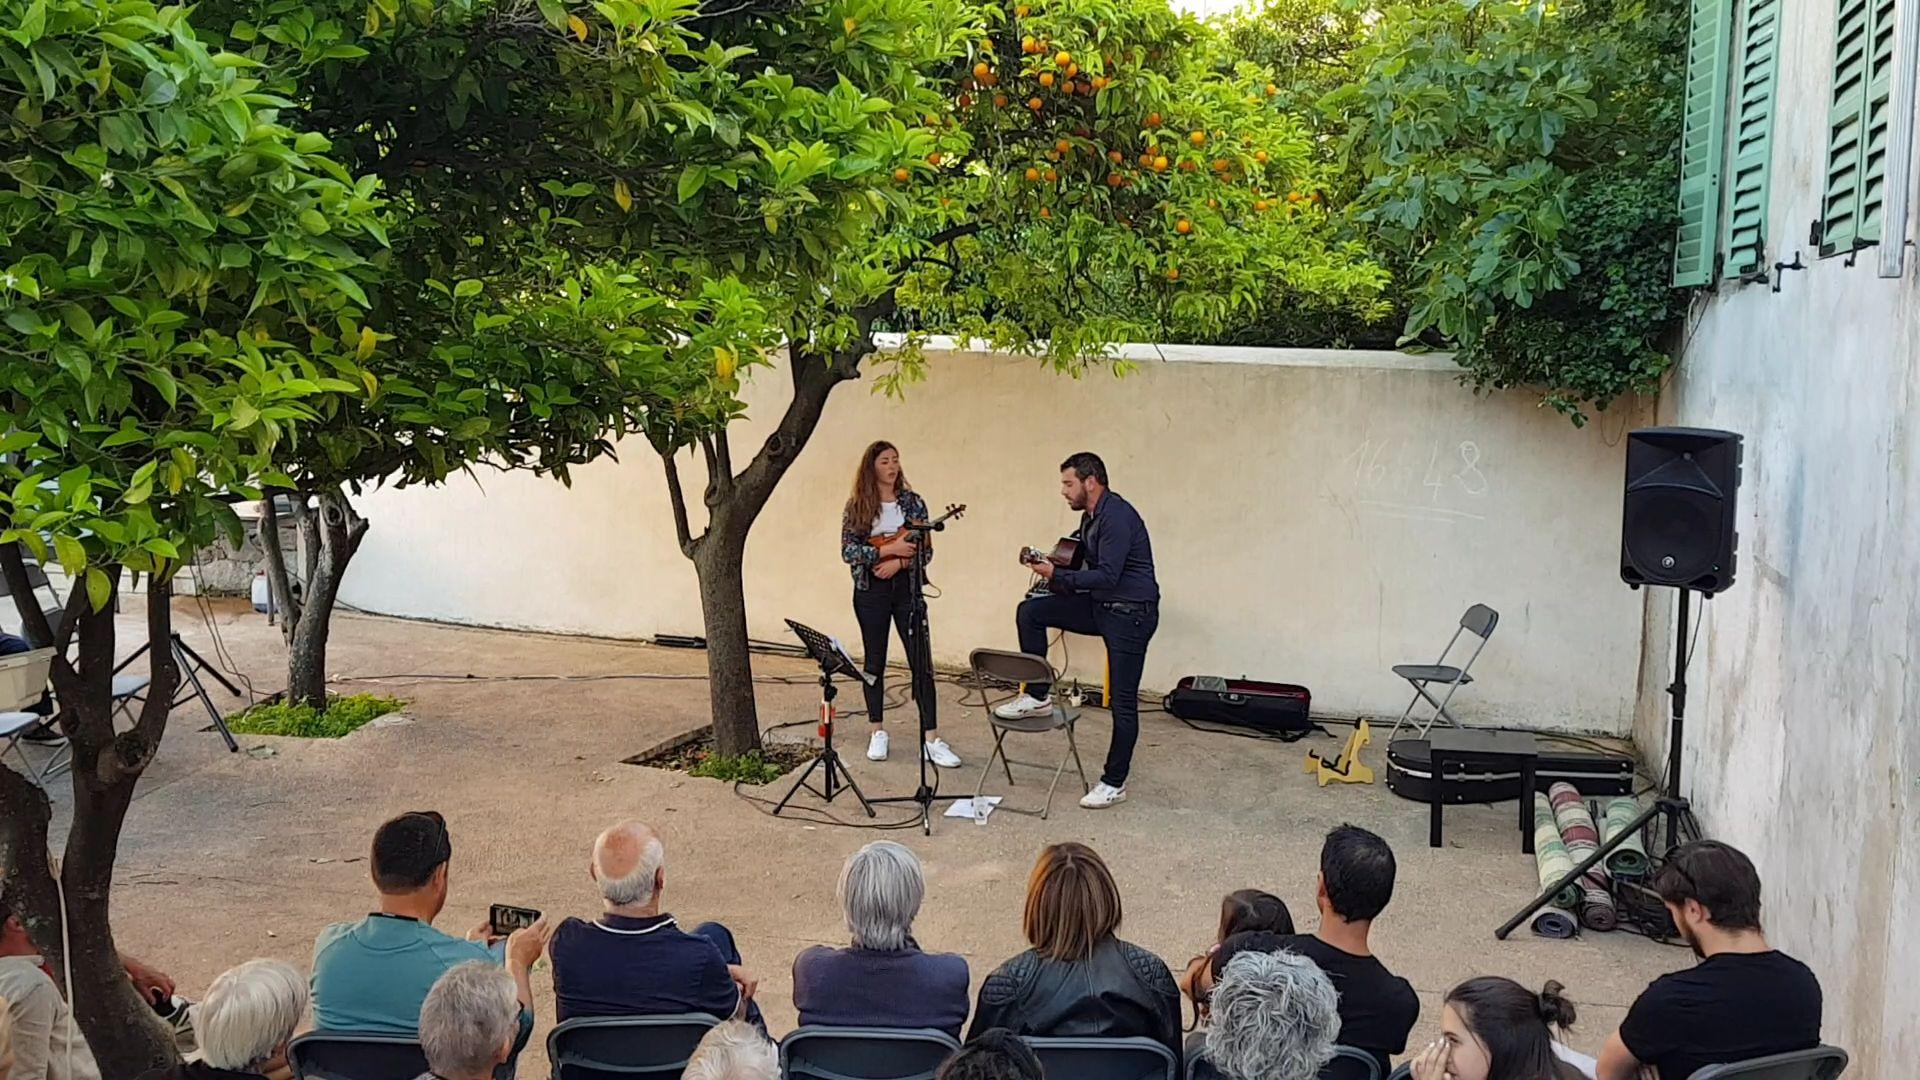 Léa et Nicolas Antona à l'Auditorium de Pigna ce samedi 2 novembre